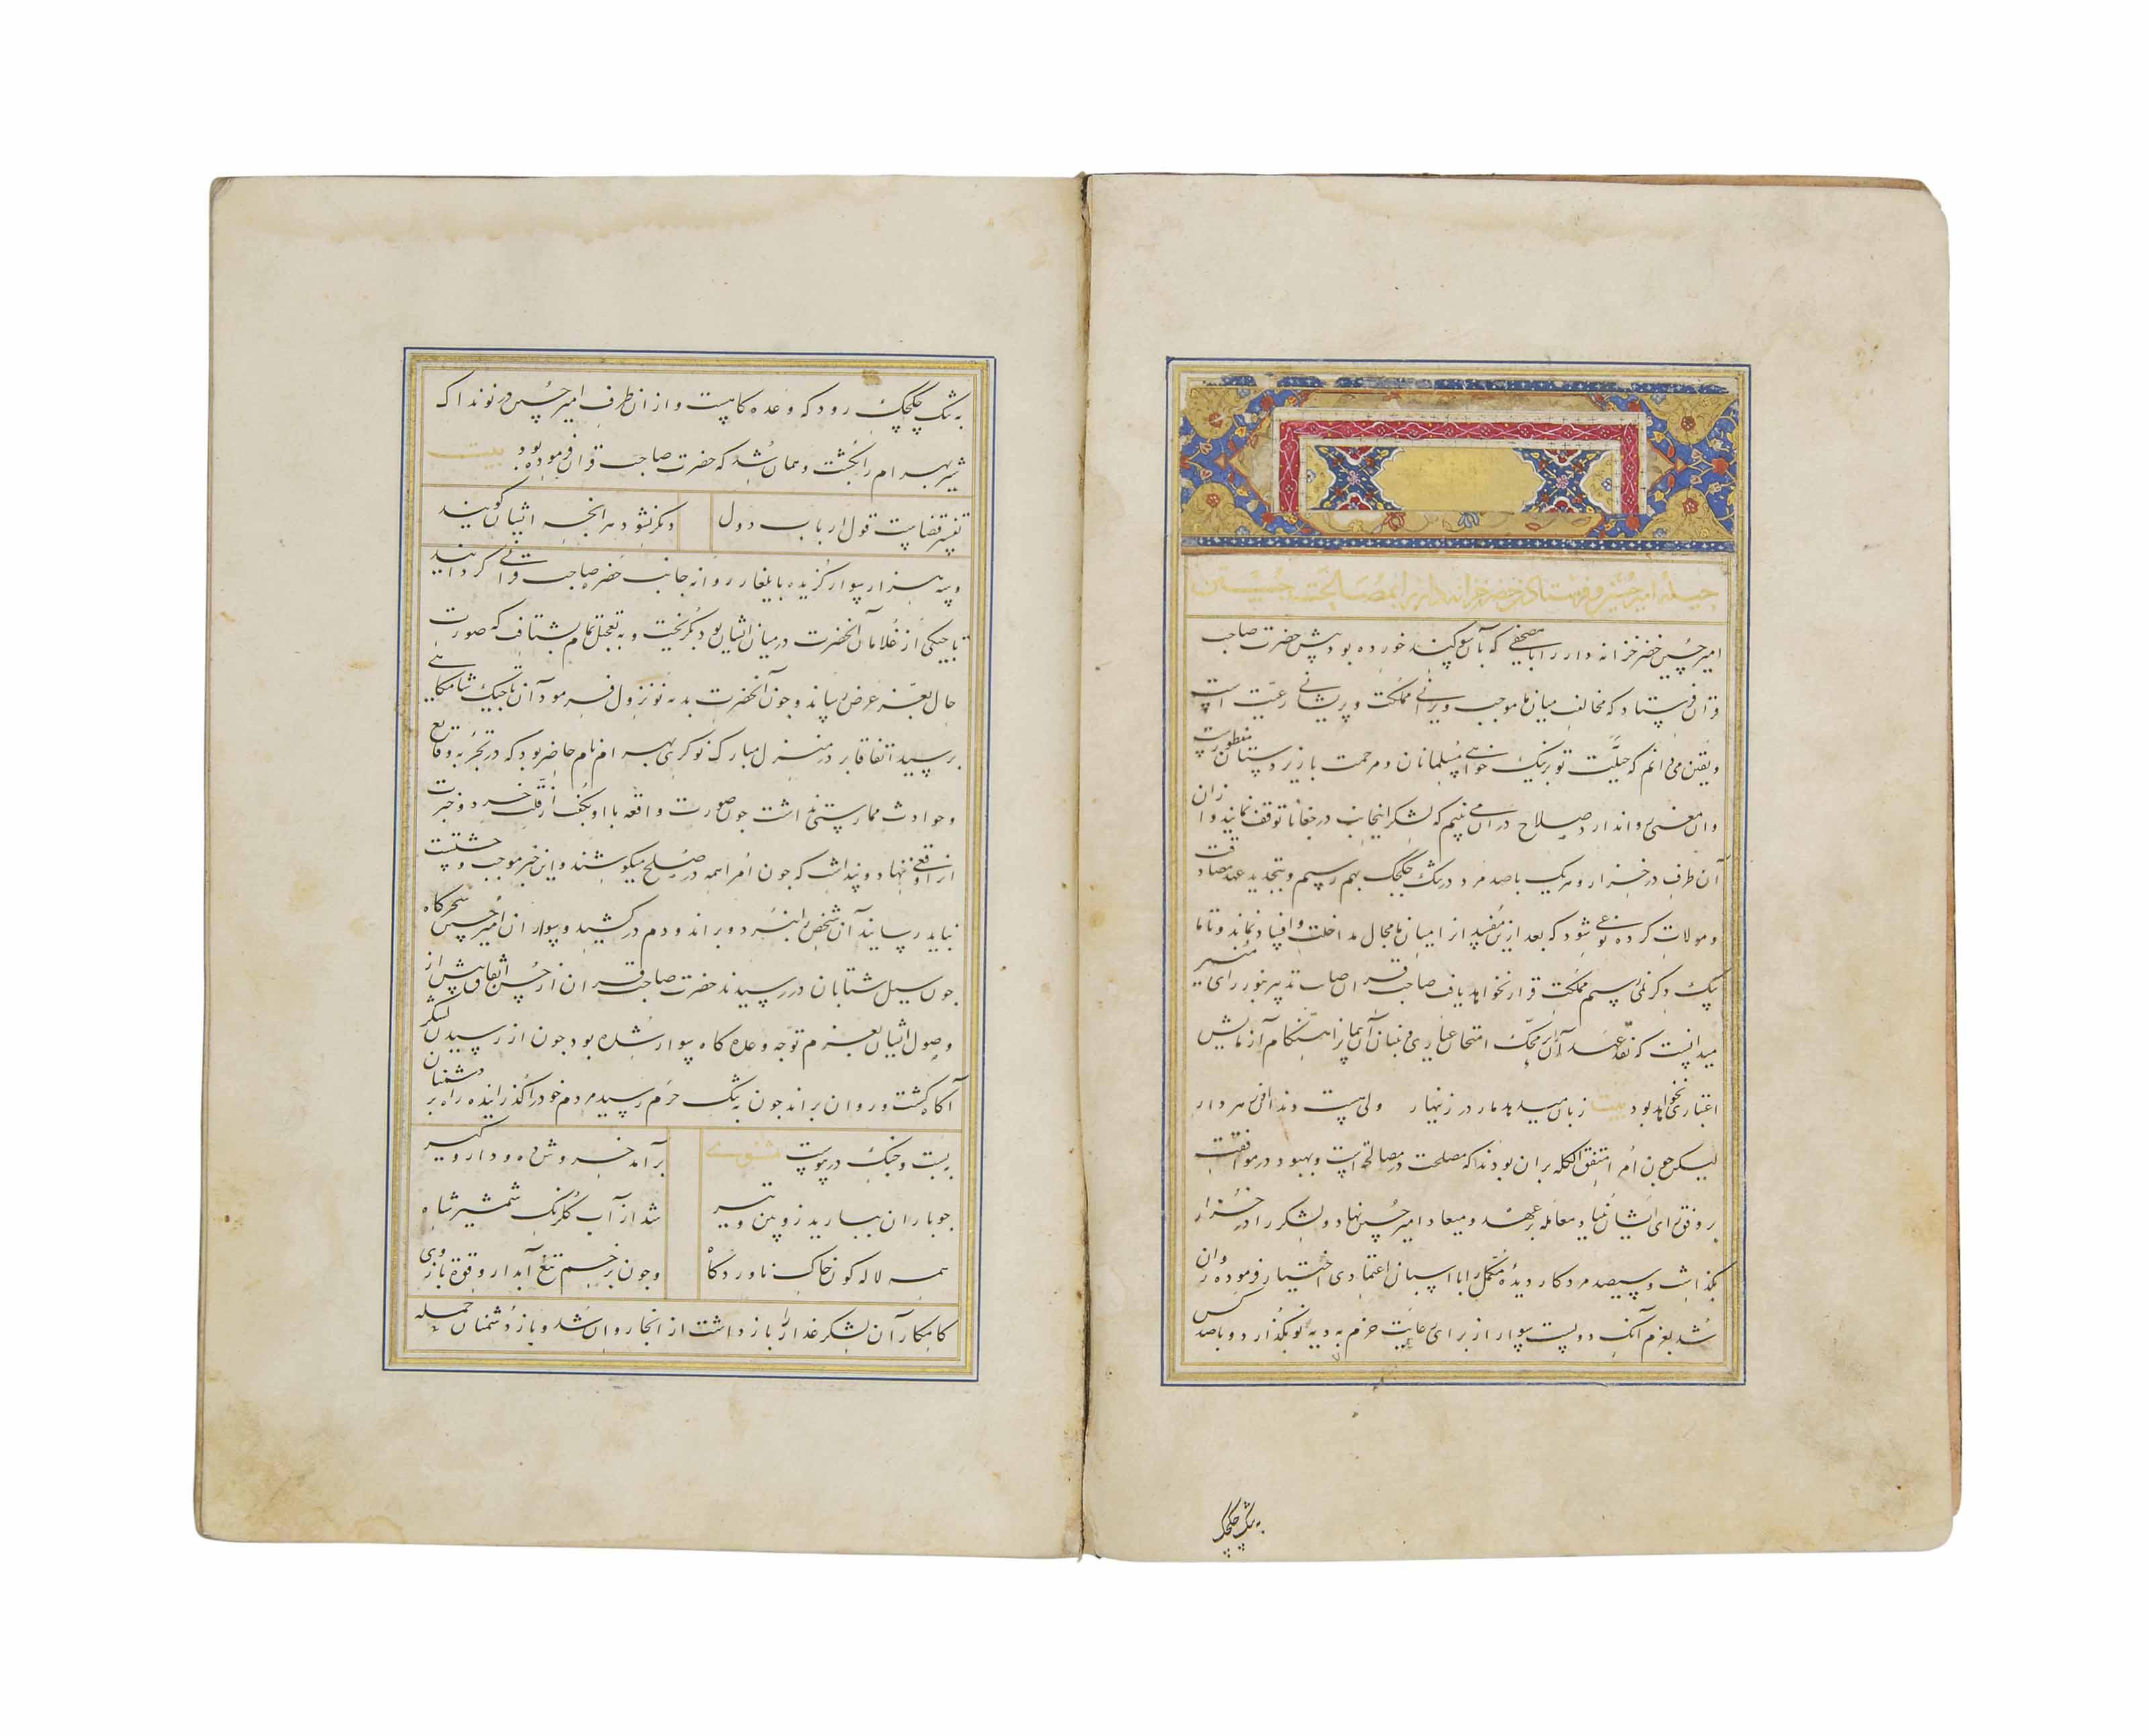 SHARAF AL-DIN AL-YAZDI (D. 145